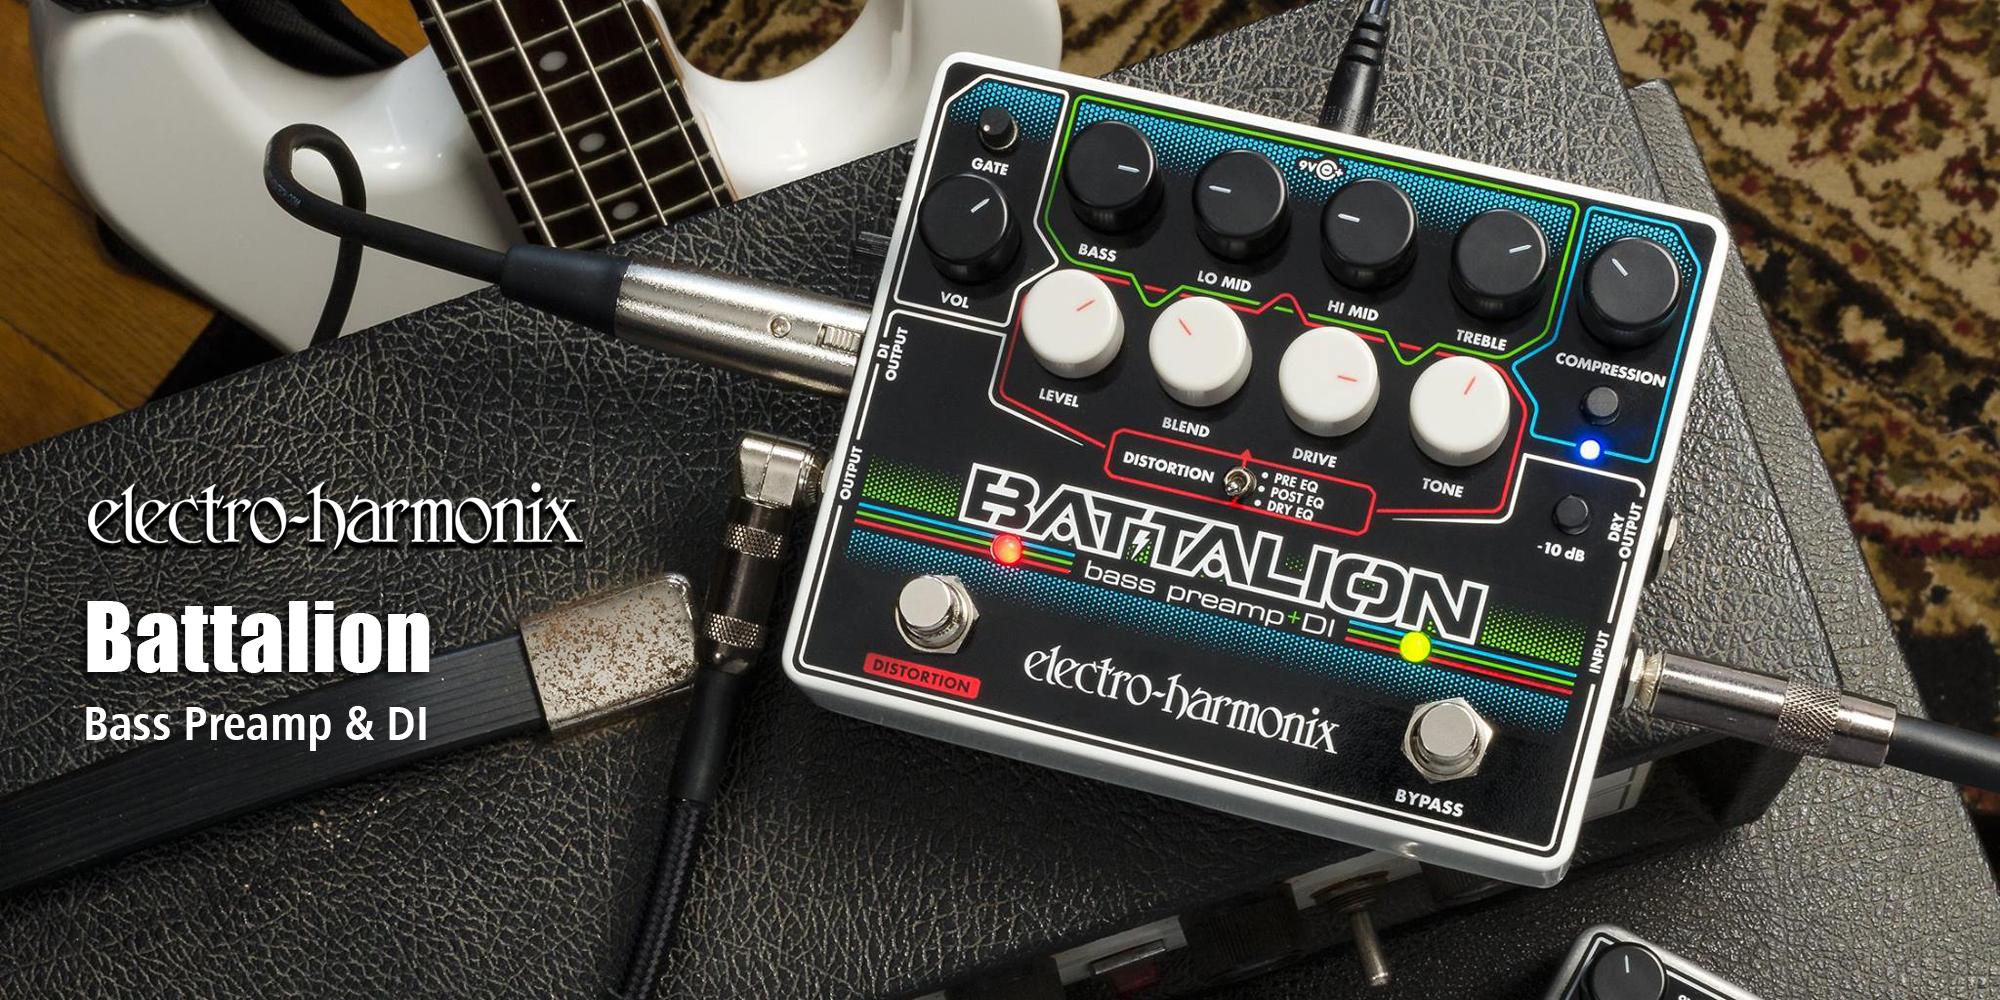 Electro-Harmonix 新製品 Battalion リリース!